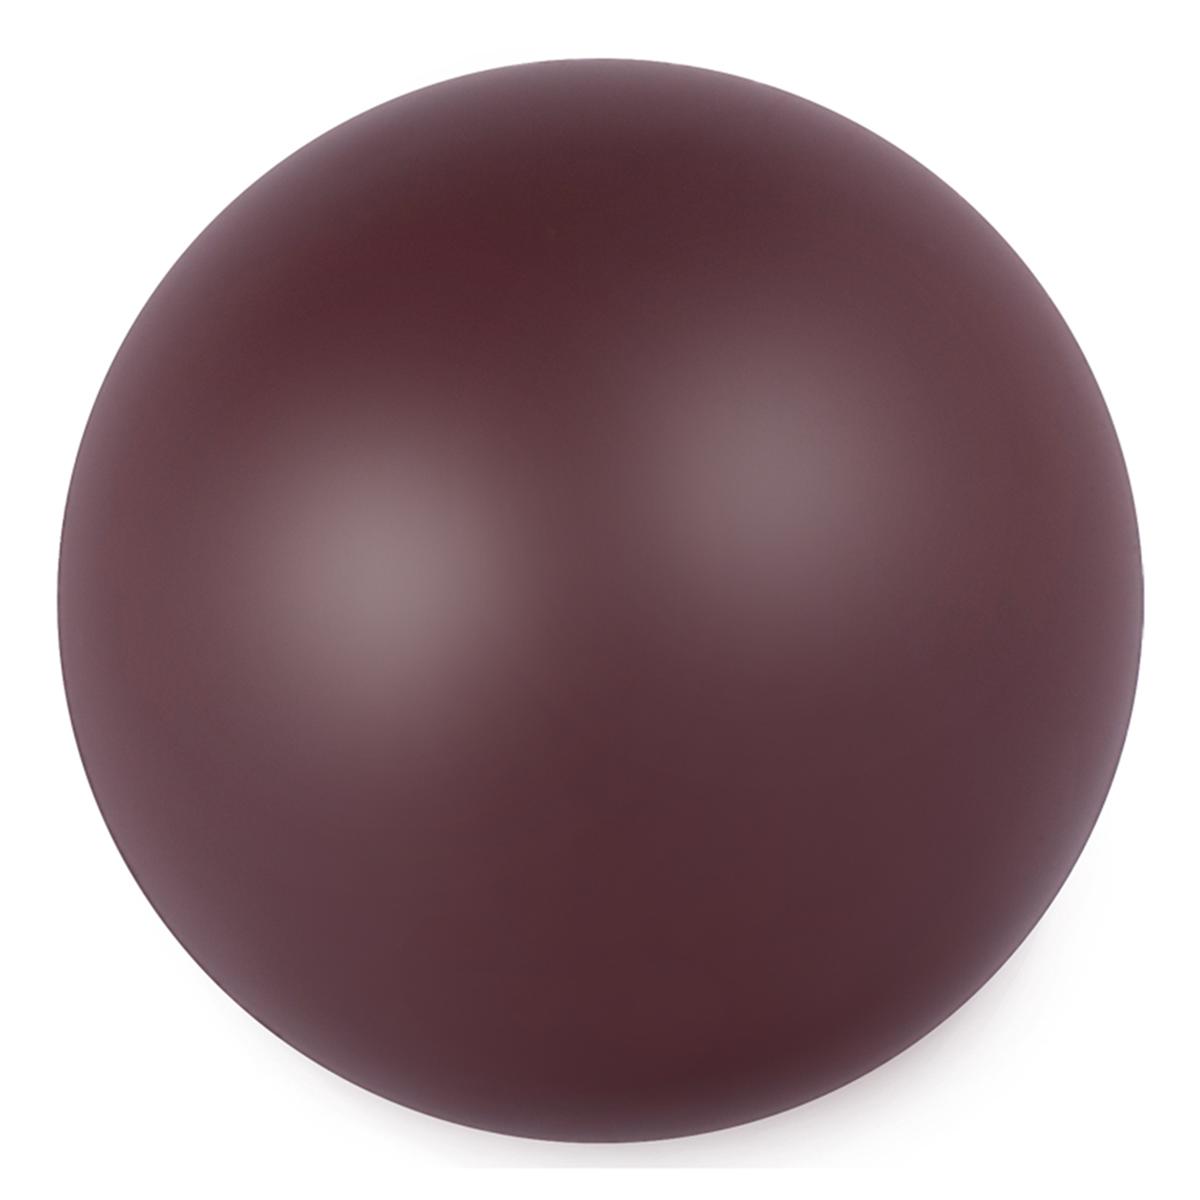 Round Stress Ball Reliever Mines Press